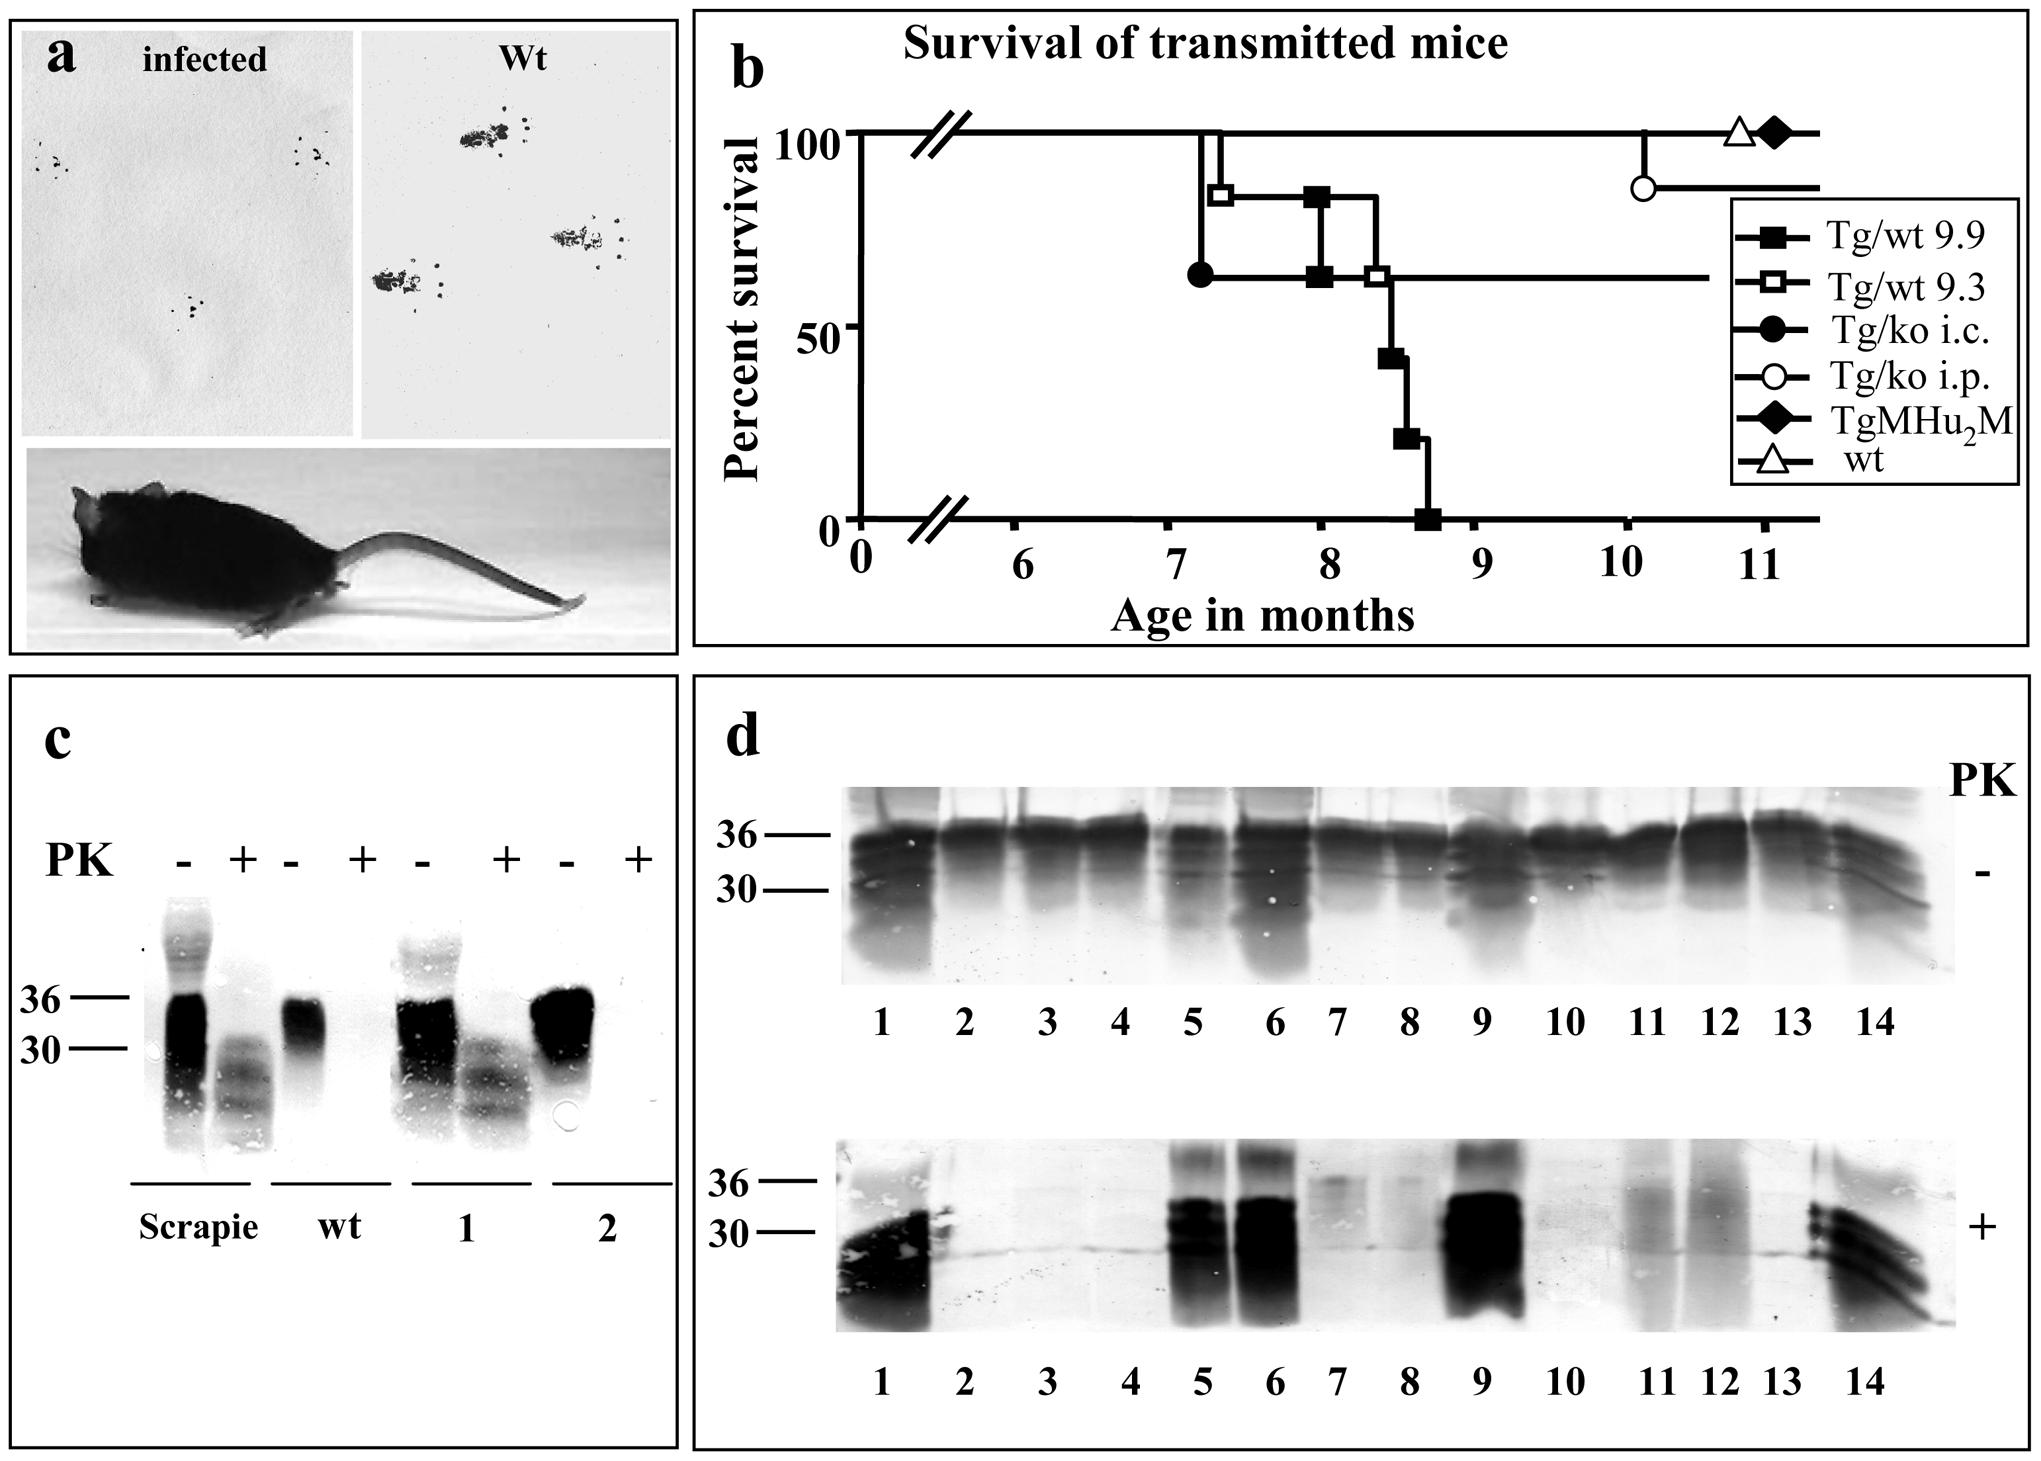 Transmission of TgMHu2ME199K prions to wt mice.